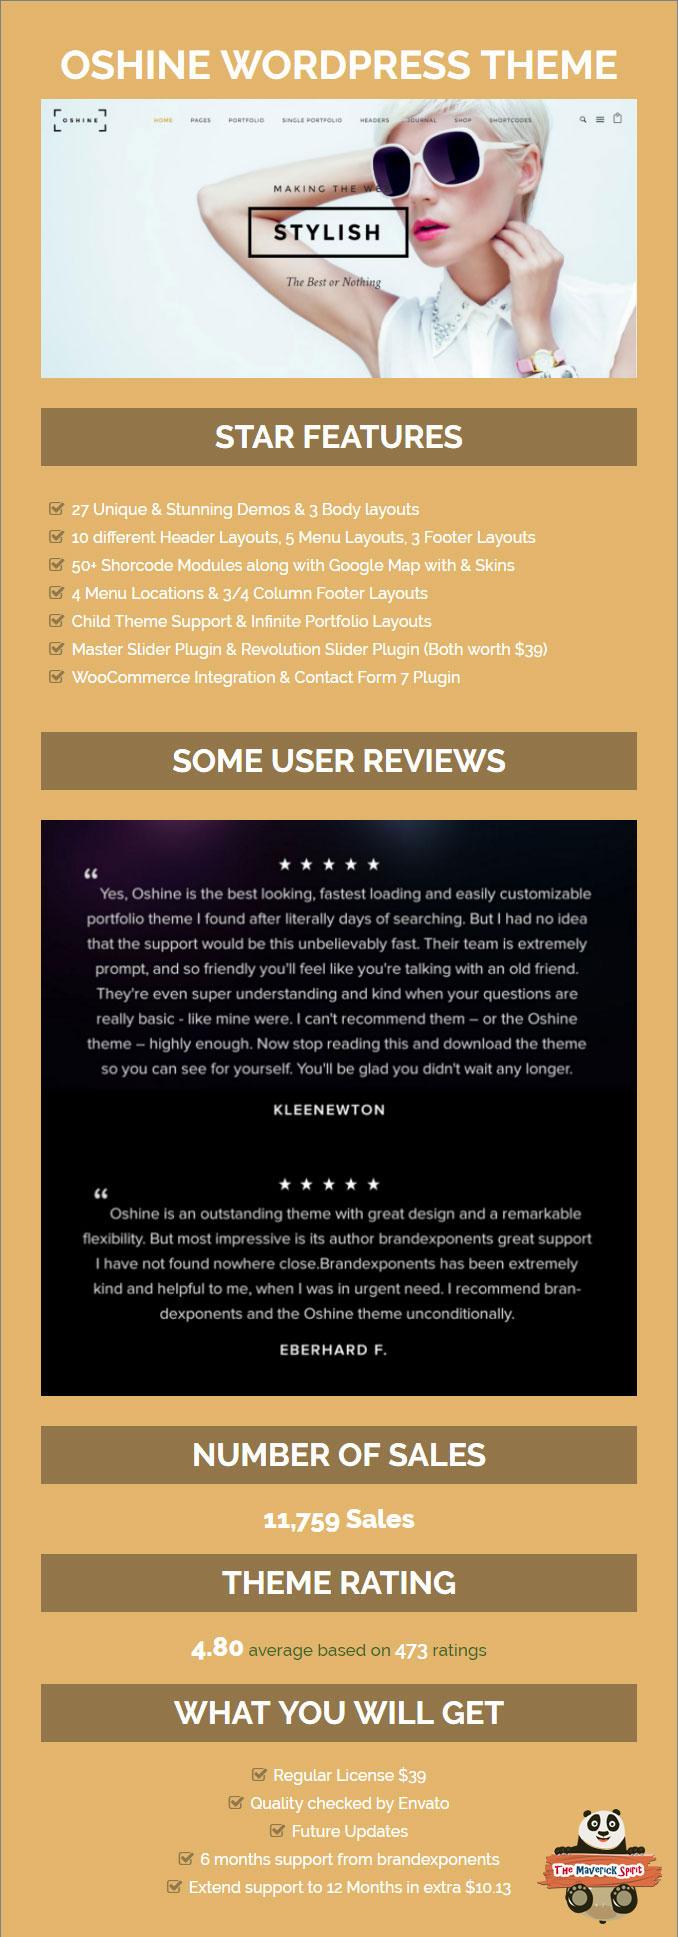 oshine-best-one-page-wordpress-themes-the-maverick-spirit